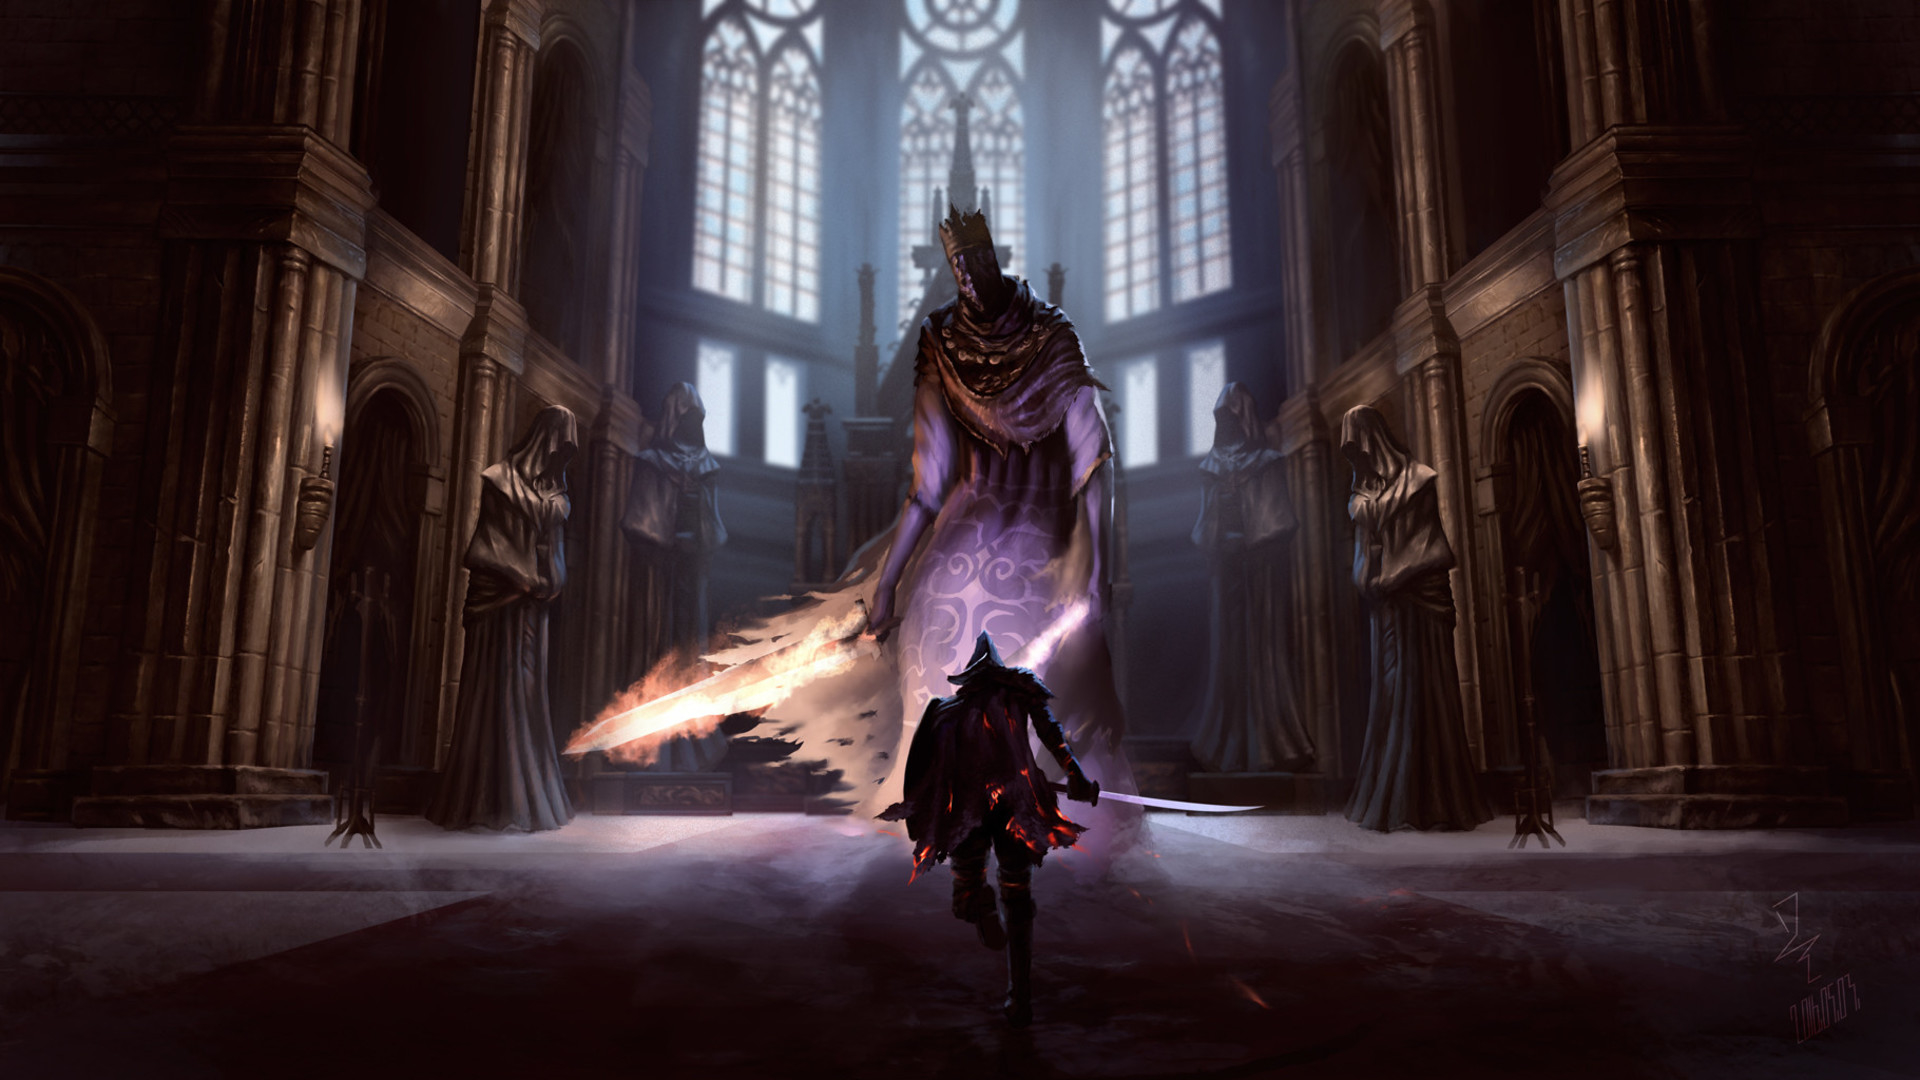 Pontiff Sulyvahn Dark Souls 3 Wallpaper Hd Games 4k Wallpapers